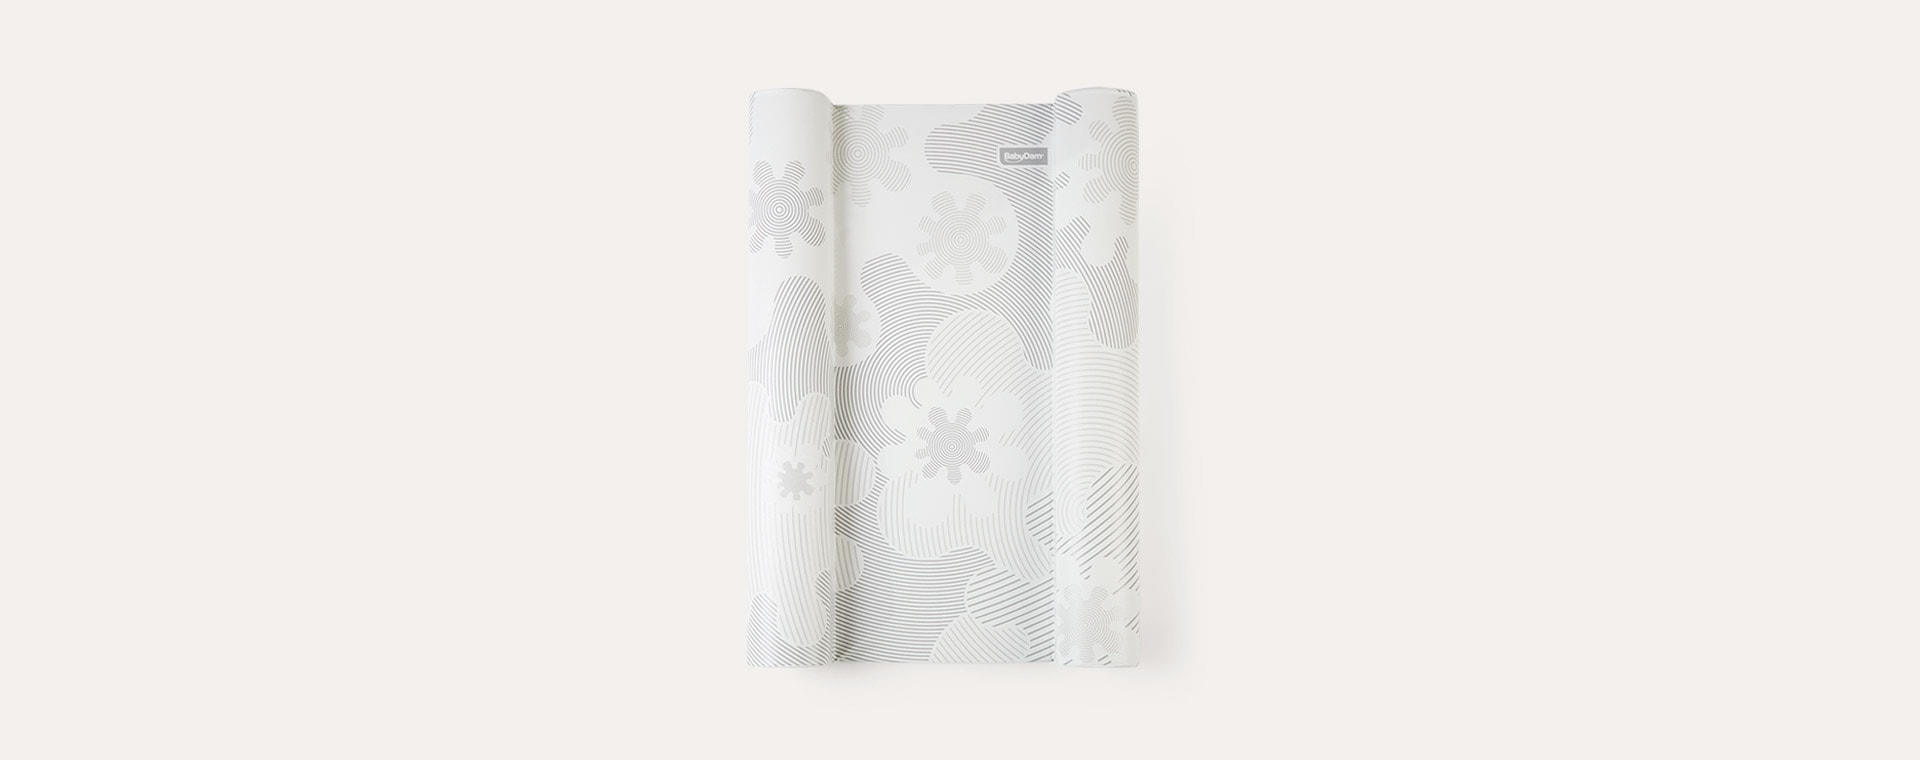 Grey/White BabyDam SuperSnug Change Mat